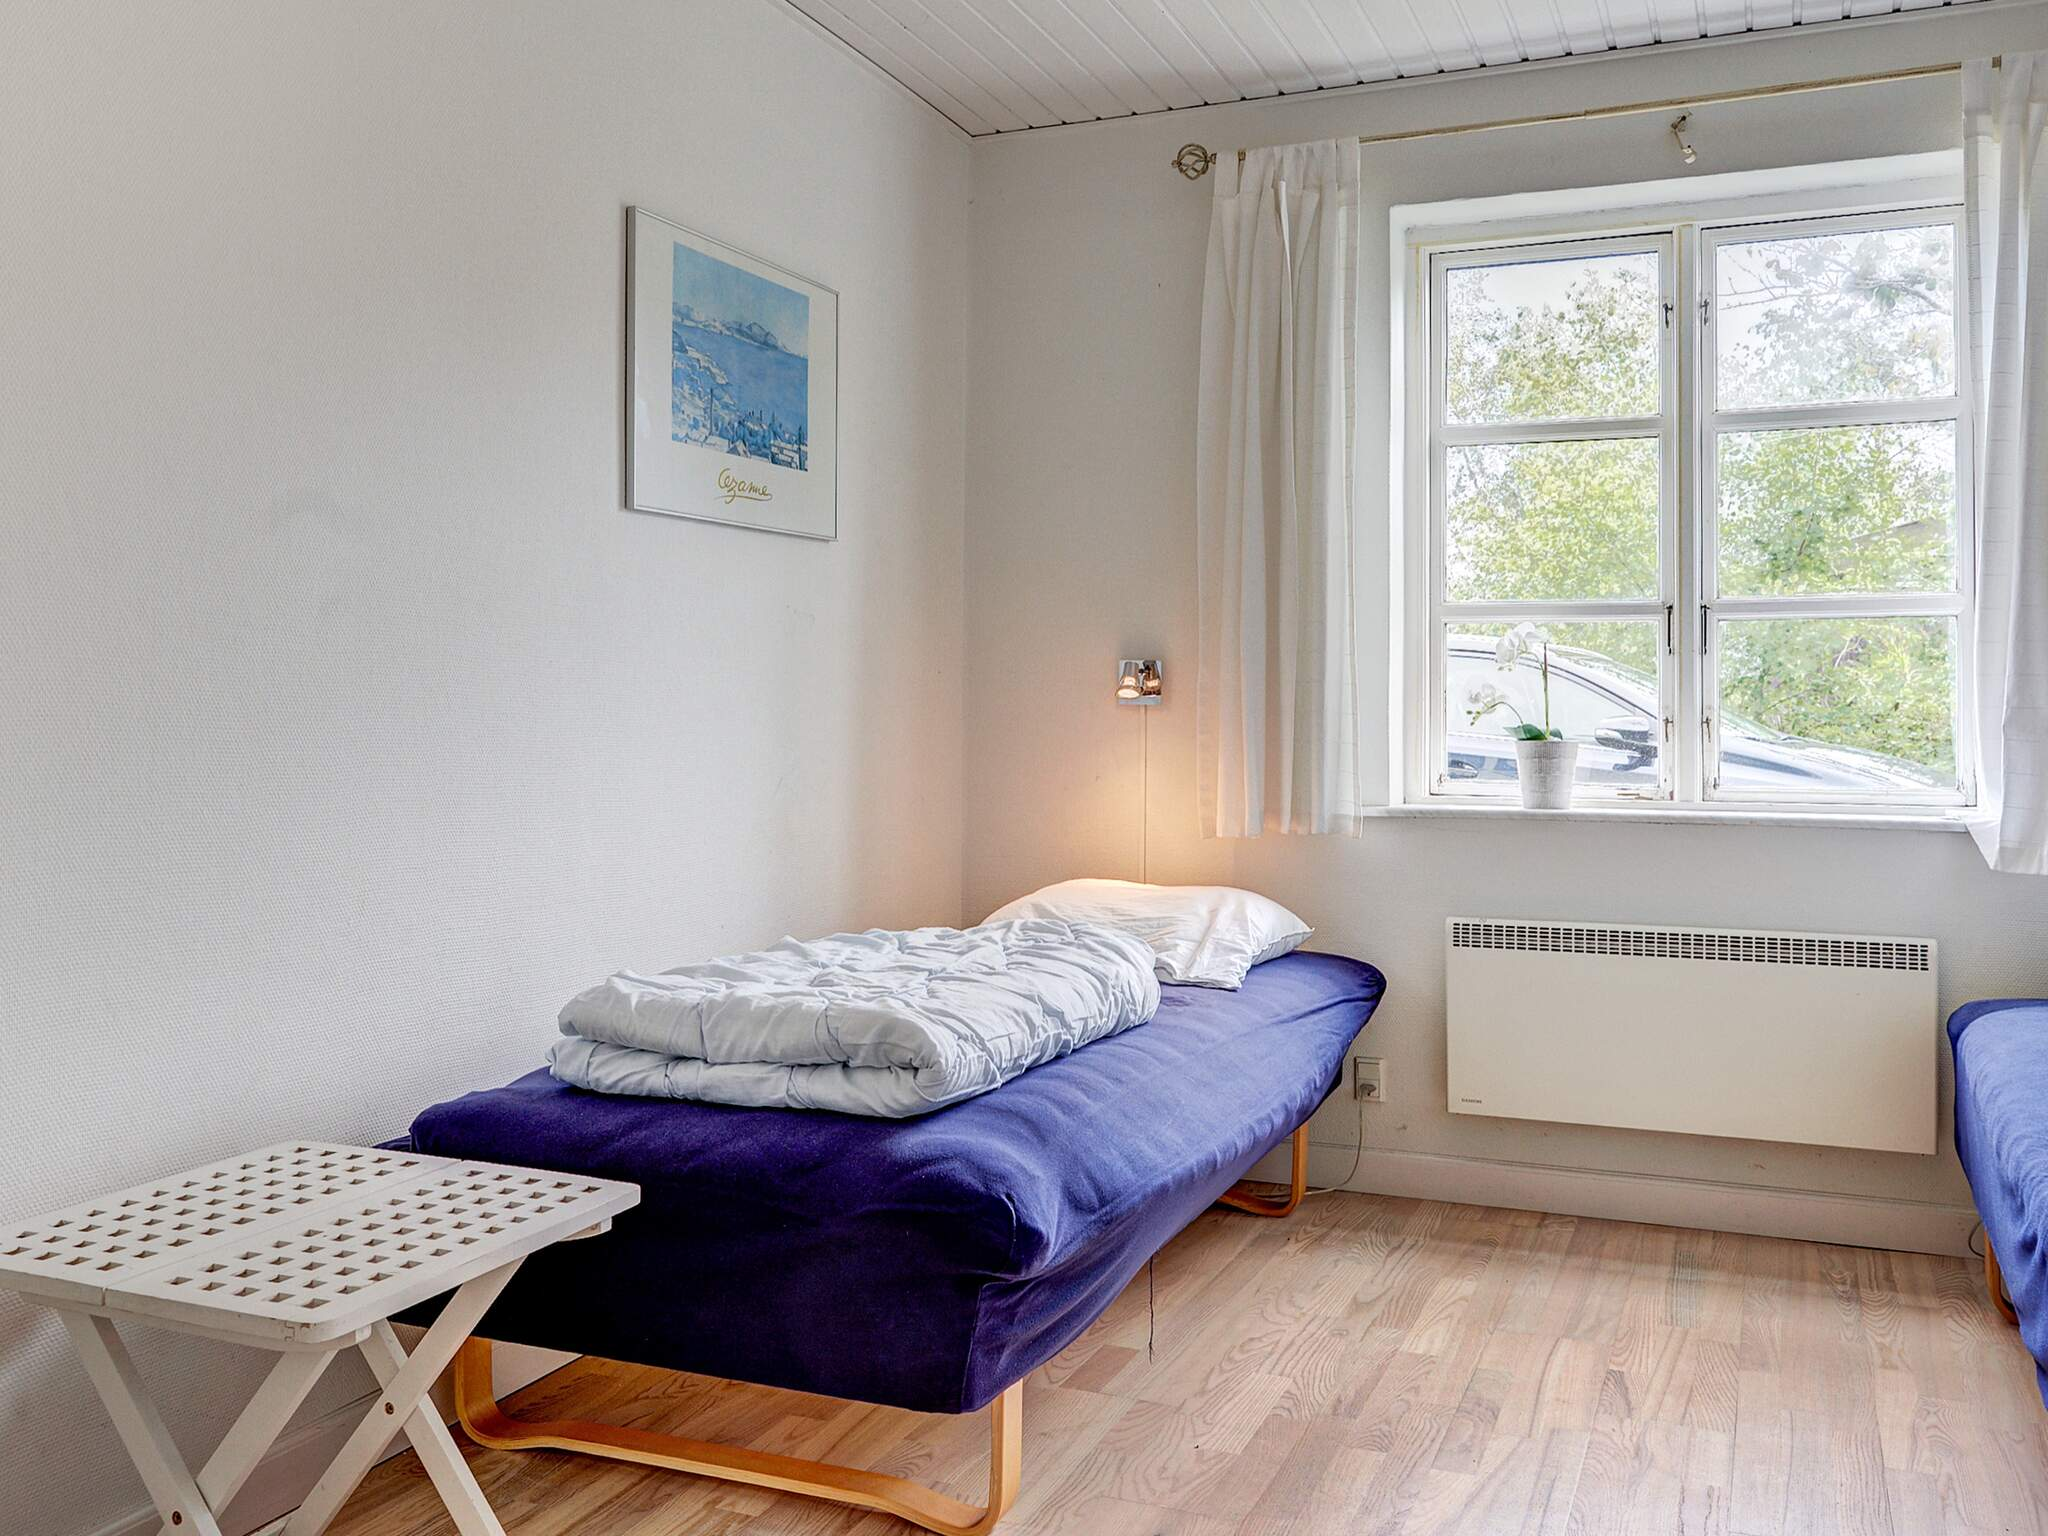 Ferienhaus Balka Strand (135786), Balke, , Bornholm, Dänemark, Bild 9